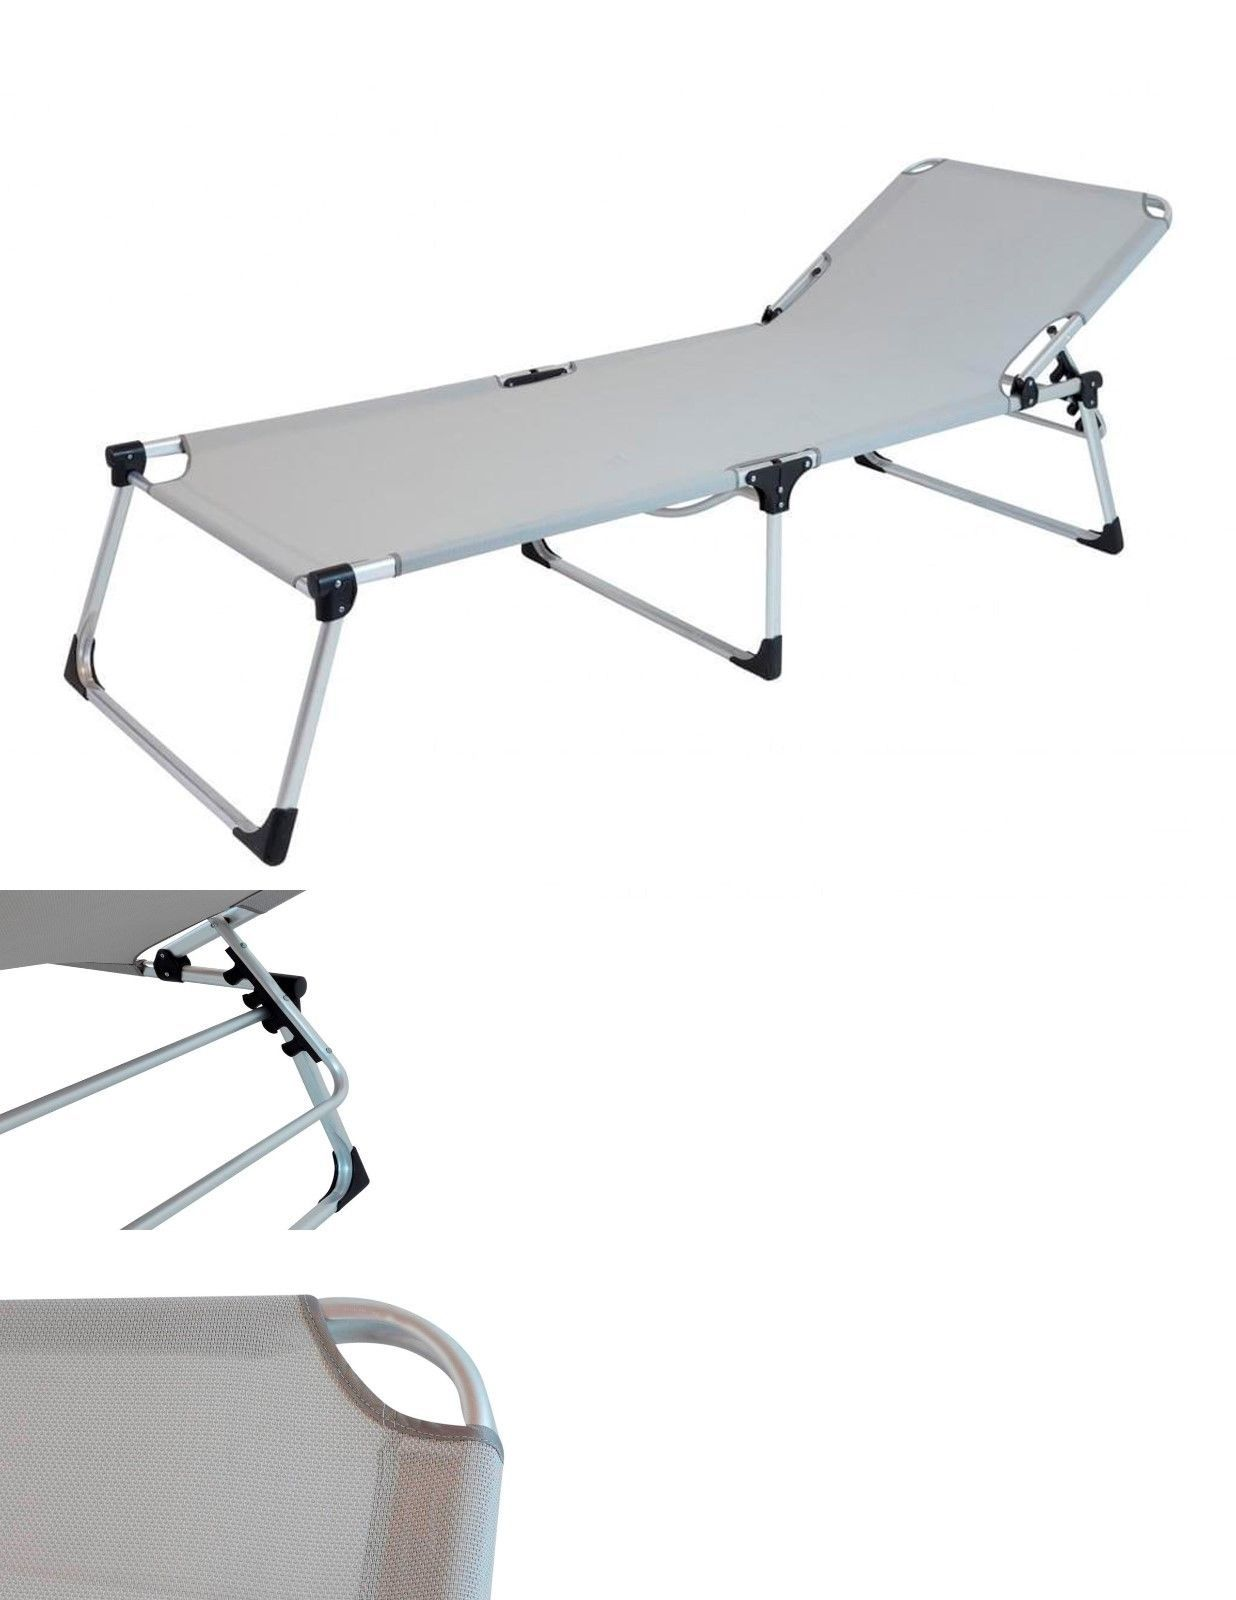 Xxl Sonnenliege Alu 200 X 70 X 40 Cm Campingliege Garte Xxl Sonnenliege Alu 200 X 70 X 40 Cm Campingliege Garten Sonnenliege Alu Sonnenliege Camping Tisch